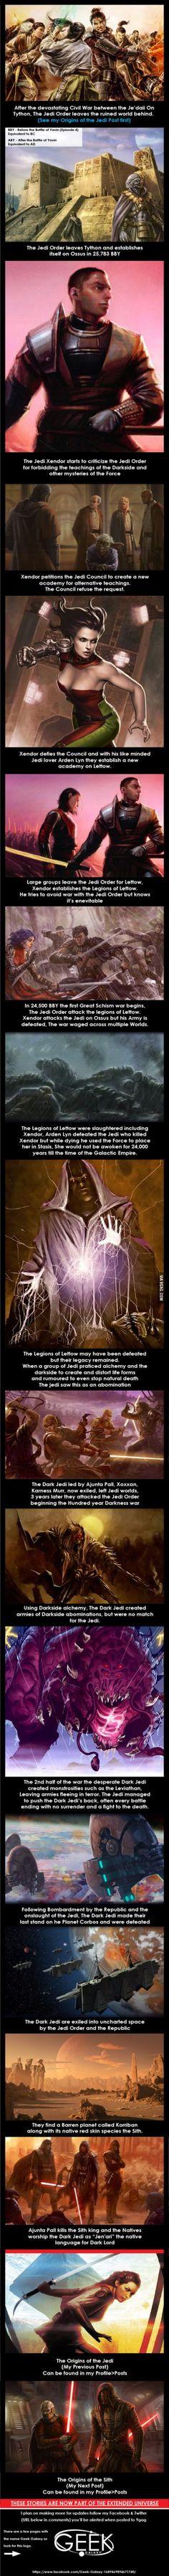 The Origins of the Dark Jedi (Star Wars History)...